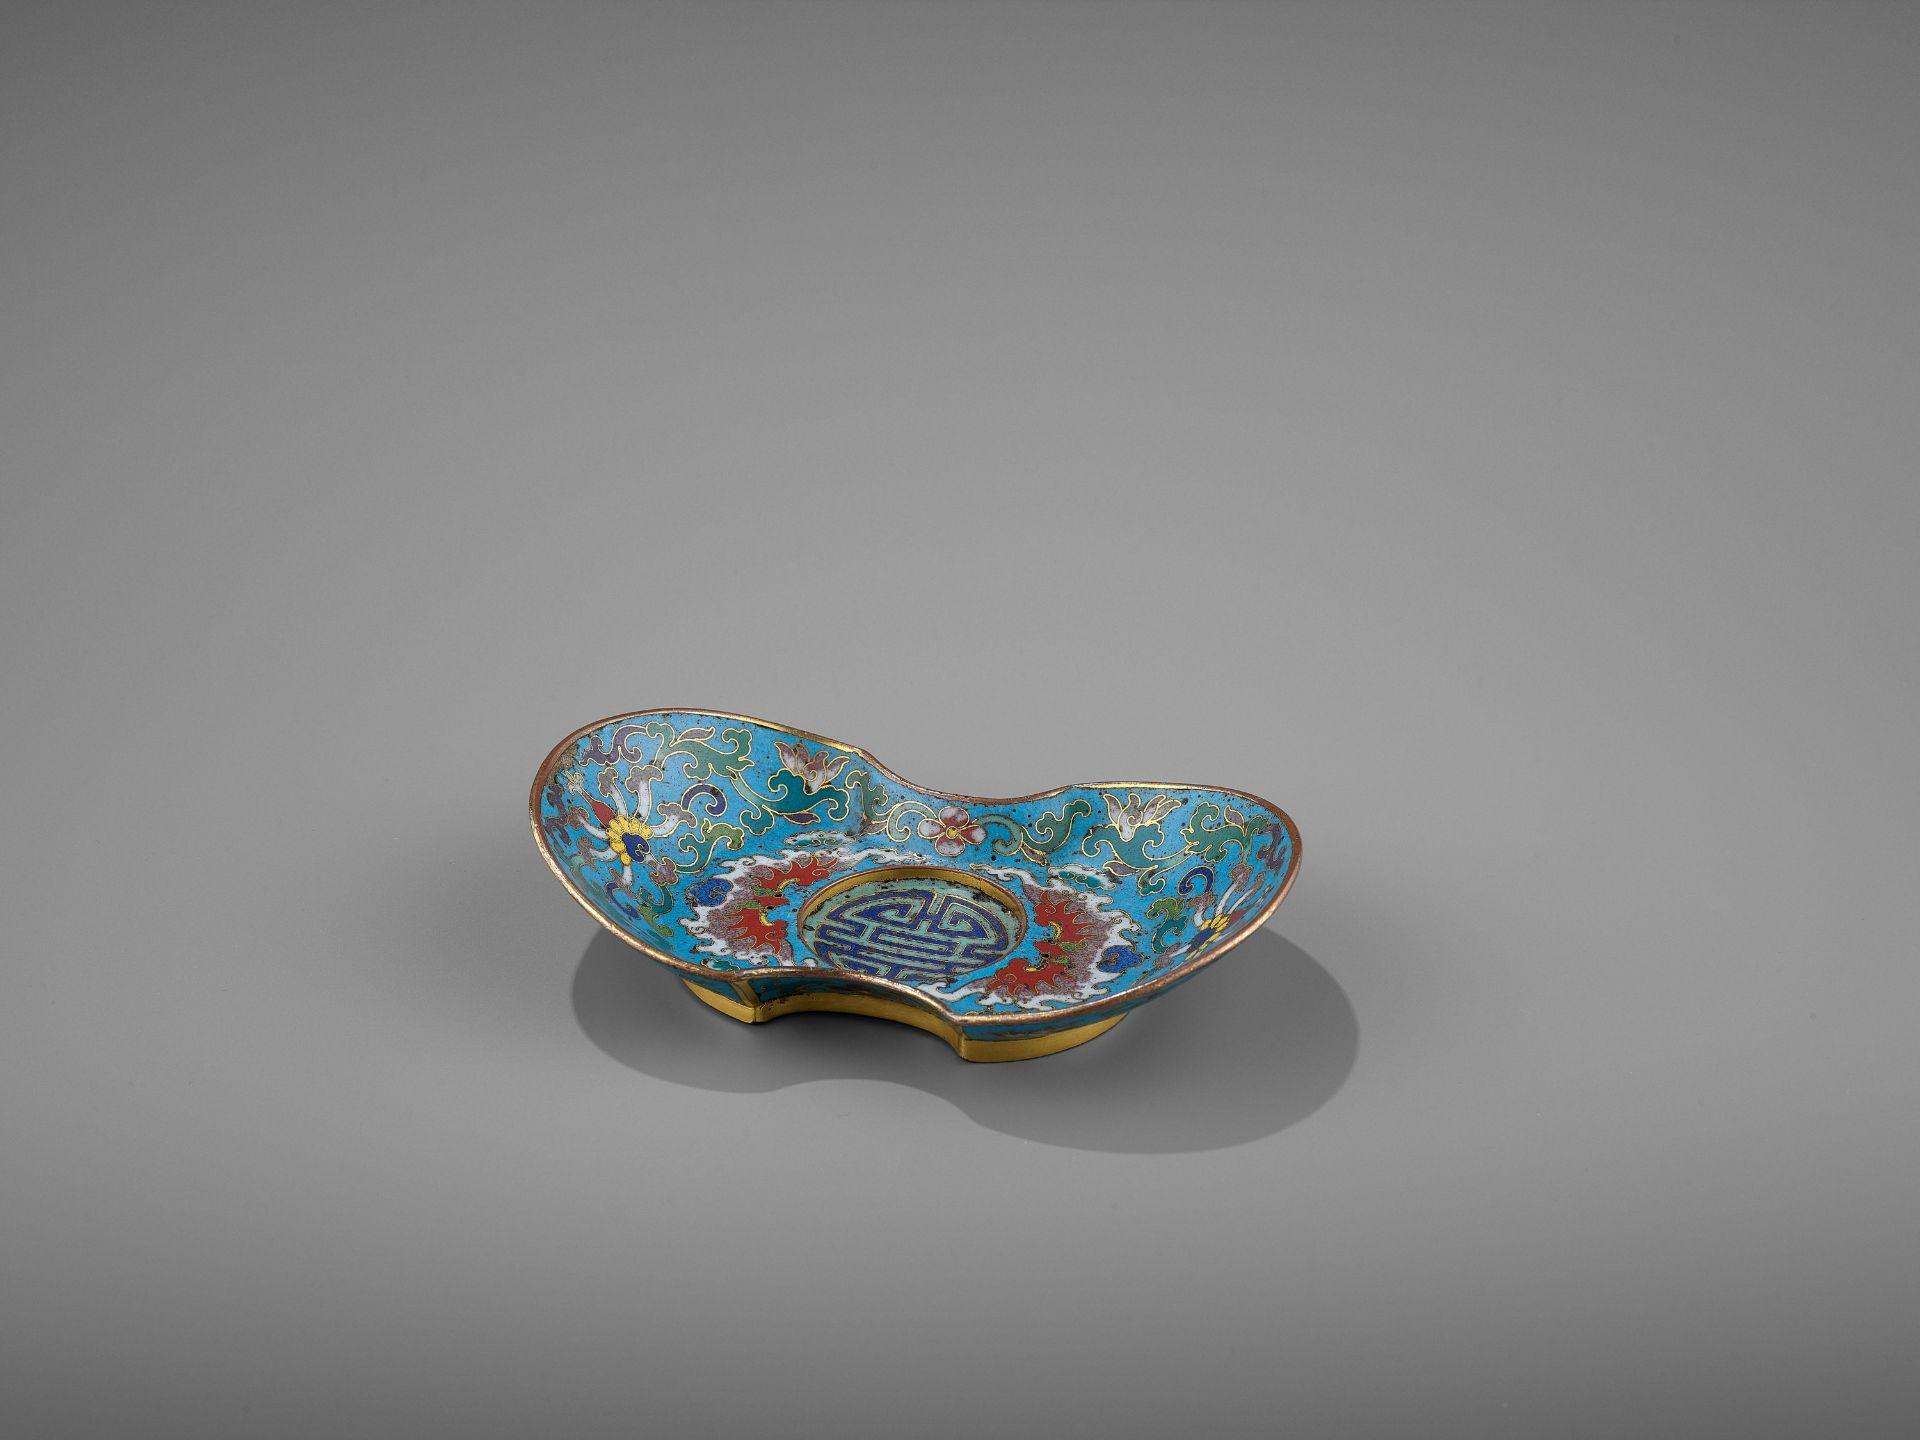 A CLOISONNE AND GILT-BRONZE 'DOUBLE HAPPINESS' CUP STAND, QIANLONG - Bild 2 aus 10